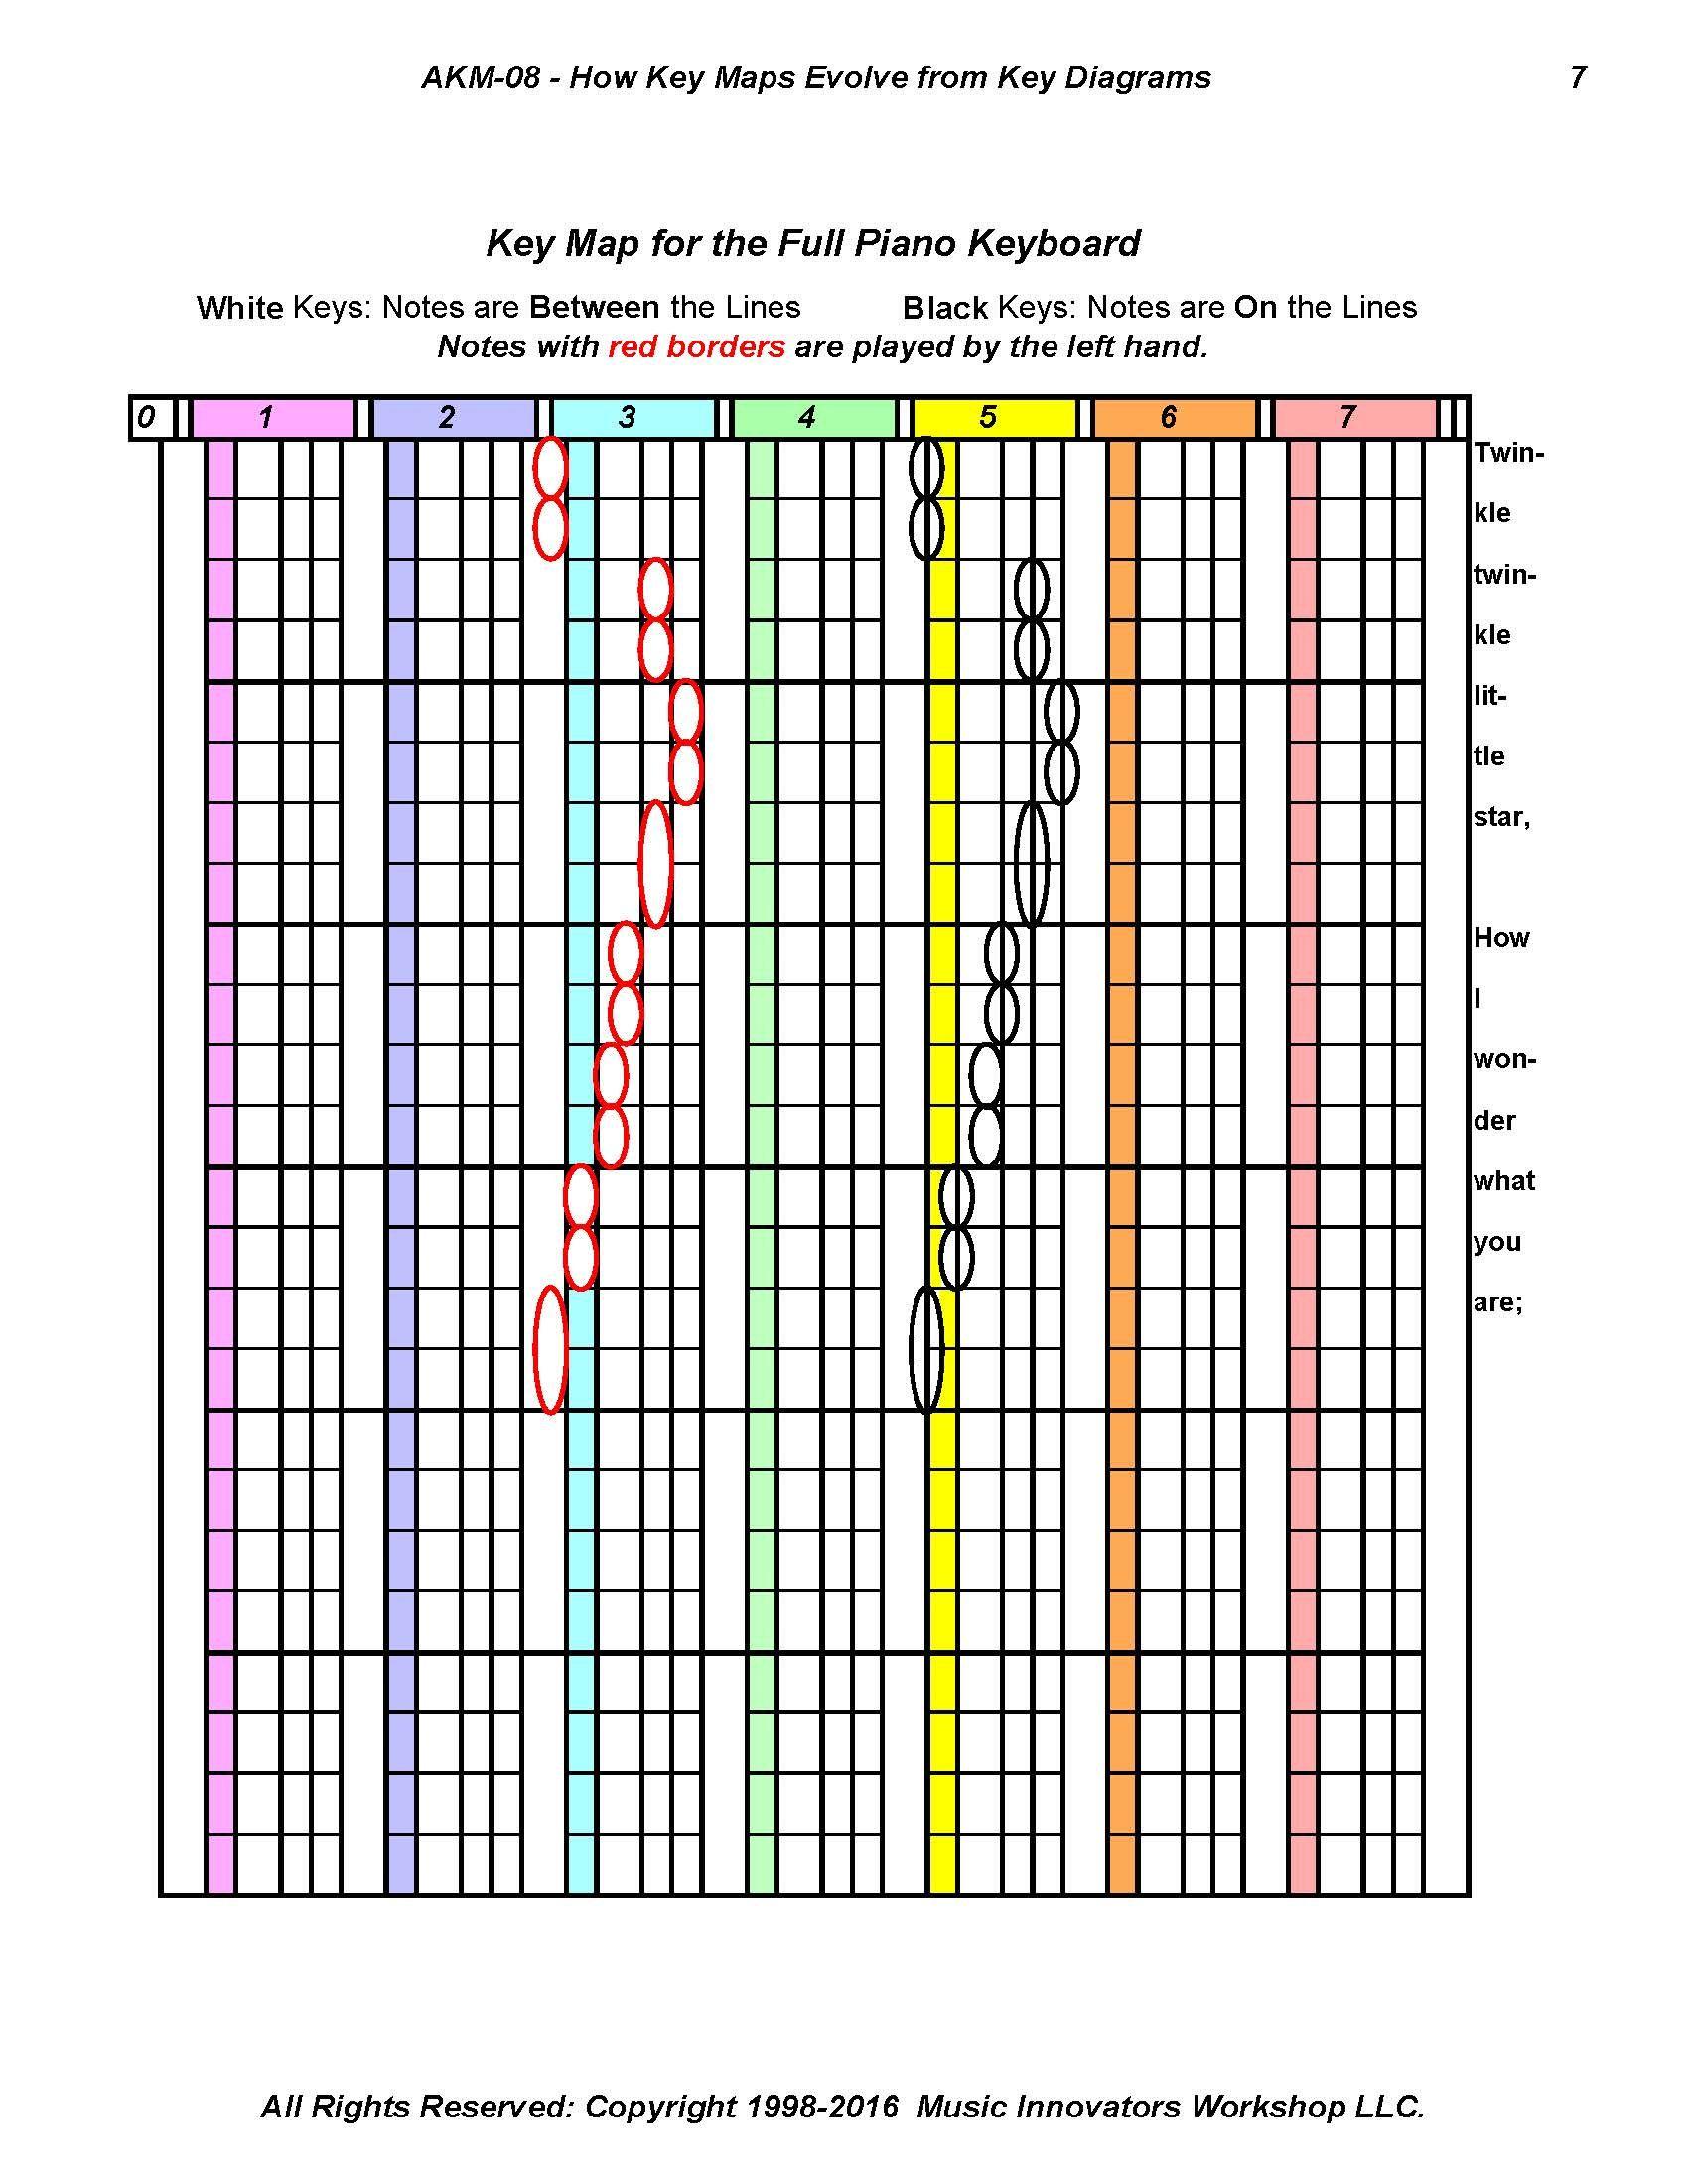 Key Map of the Full Piano Keyboard | How Key Maps Evolve